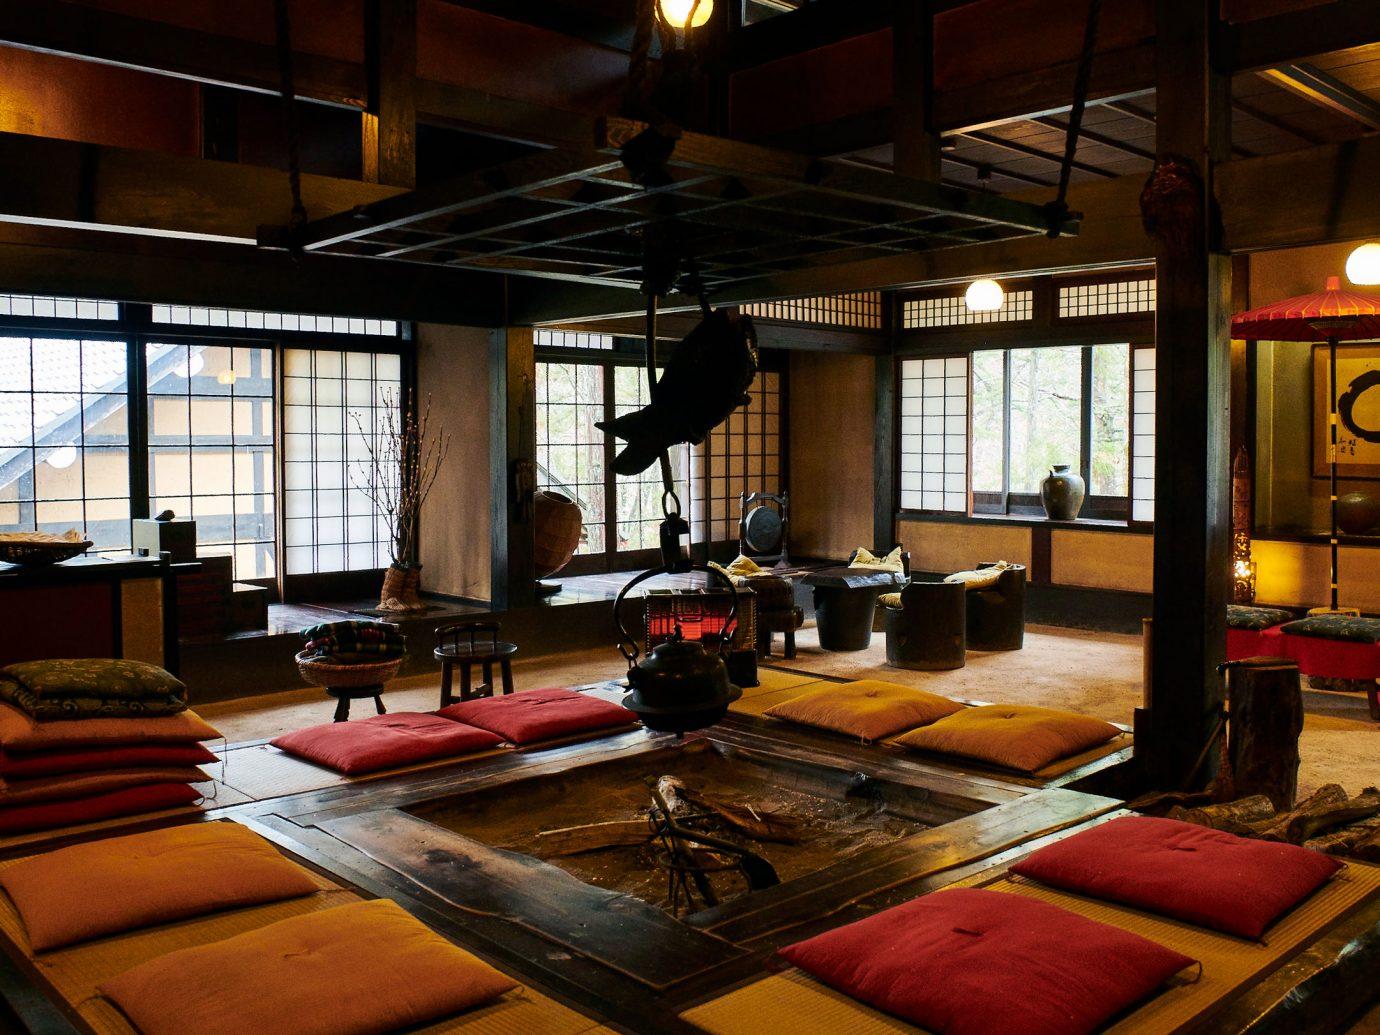 interior fireplace at Wanosato